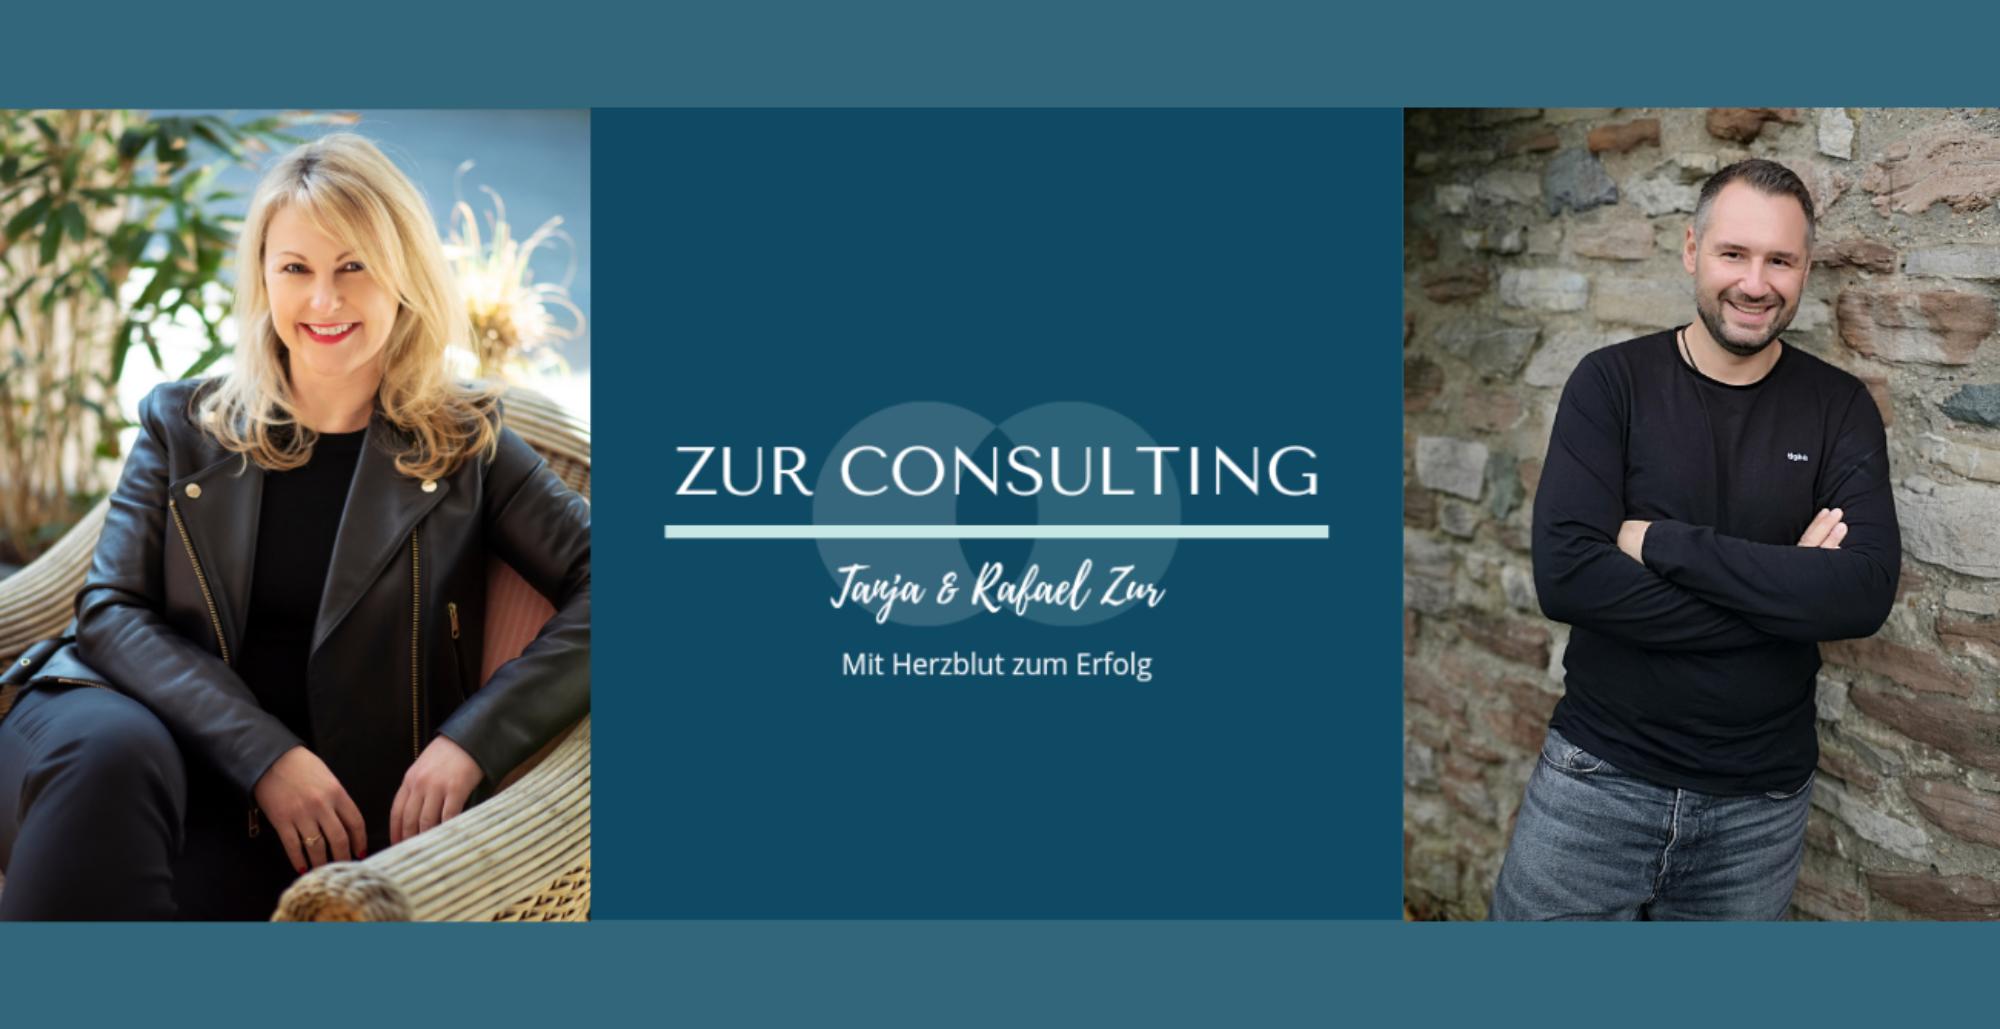 Zur Consulting